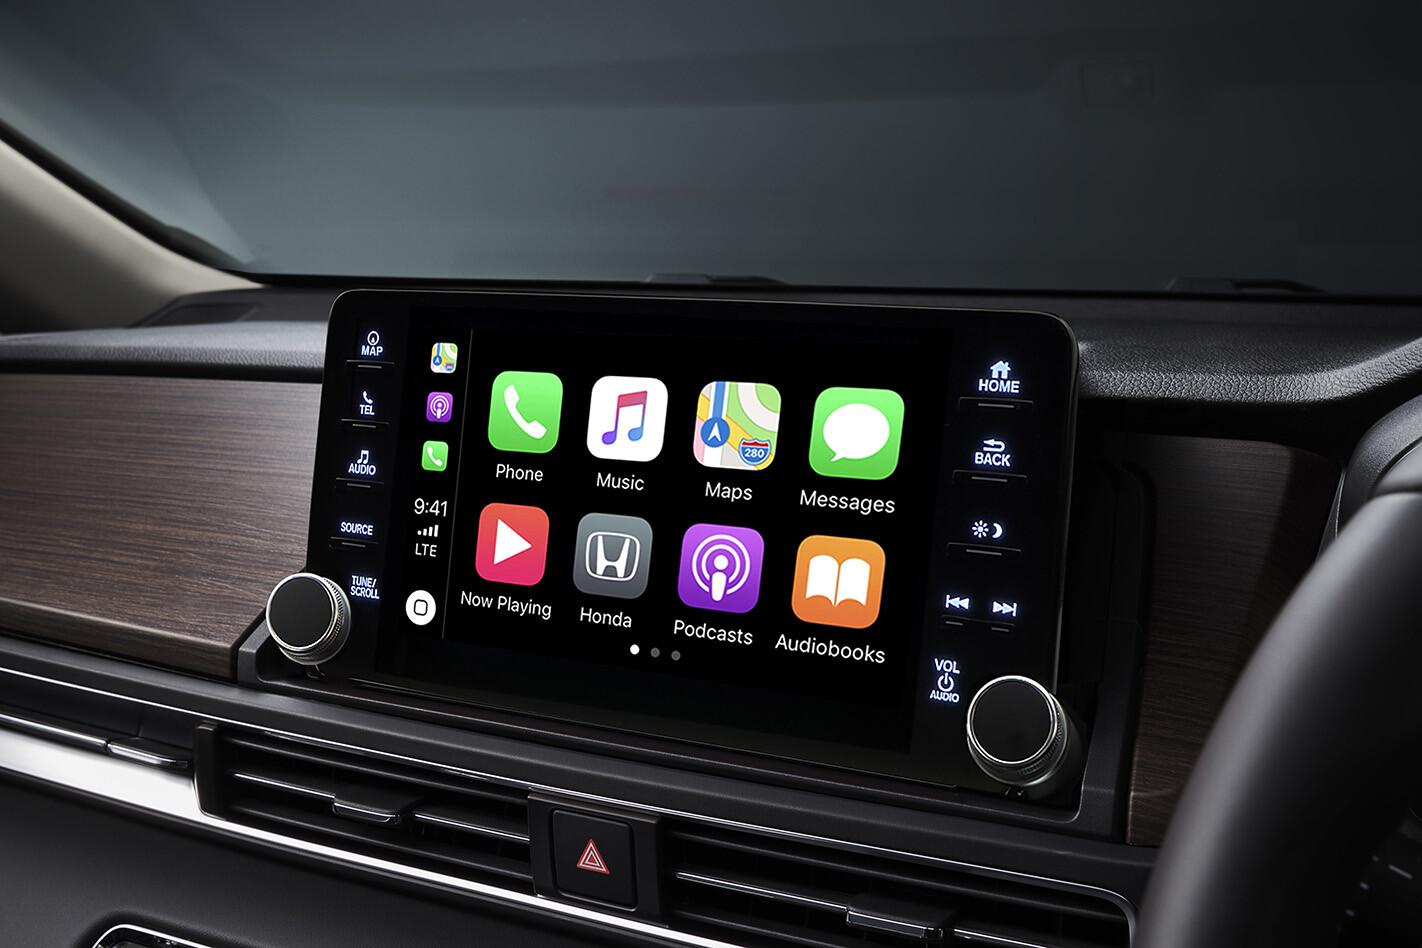 Honda Odyssey apple carplay